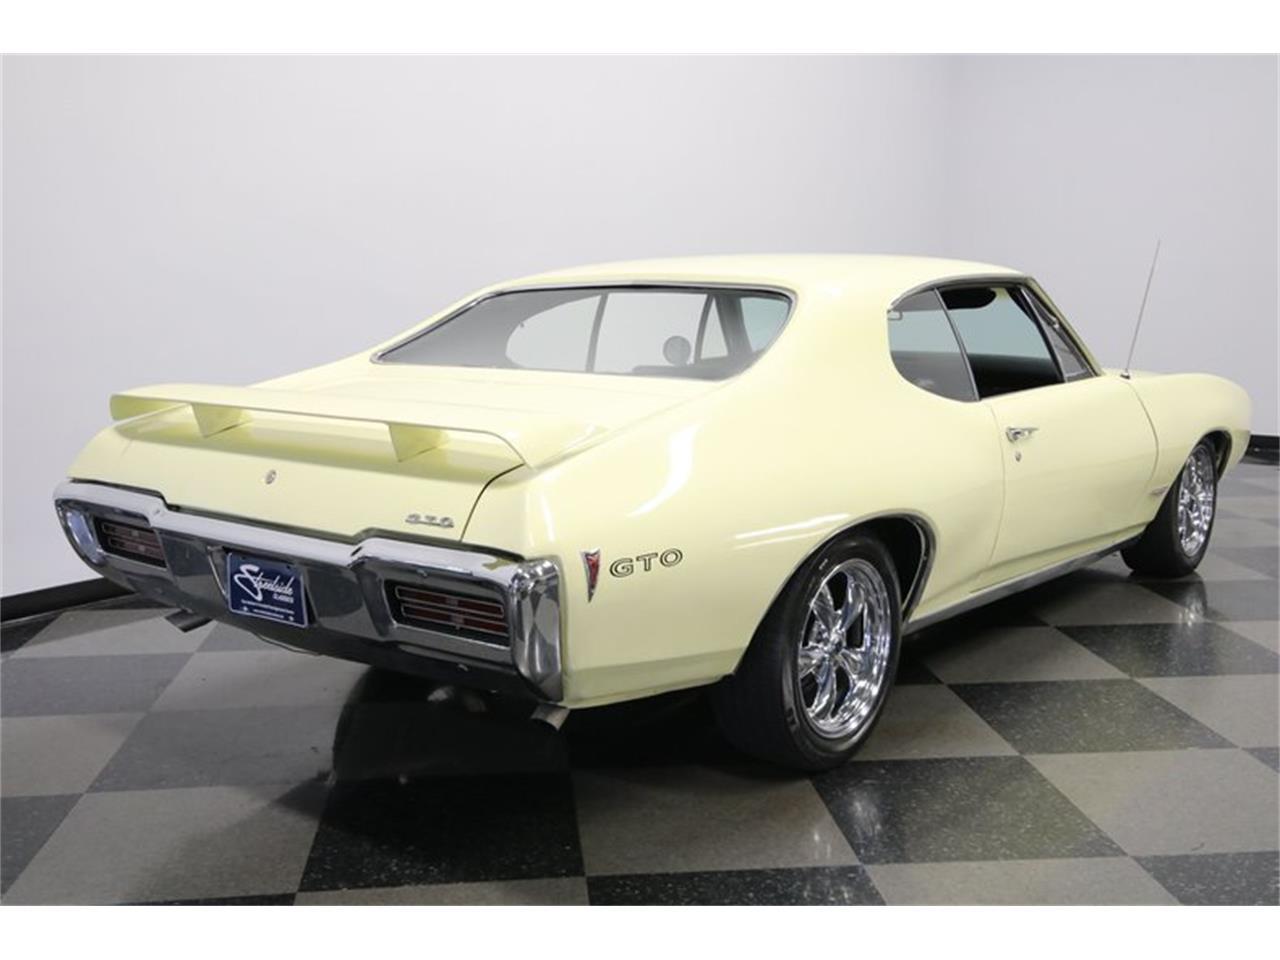 For Sale: 1968 Pontiac GTO in Lutz, Florida